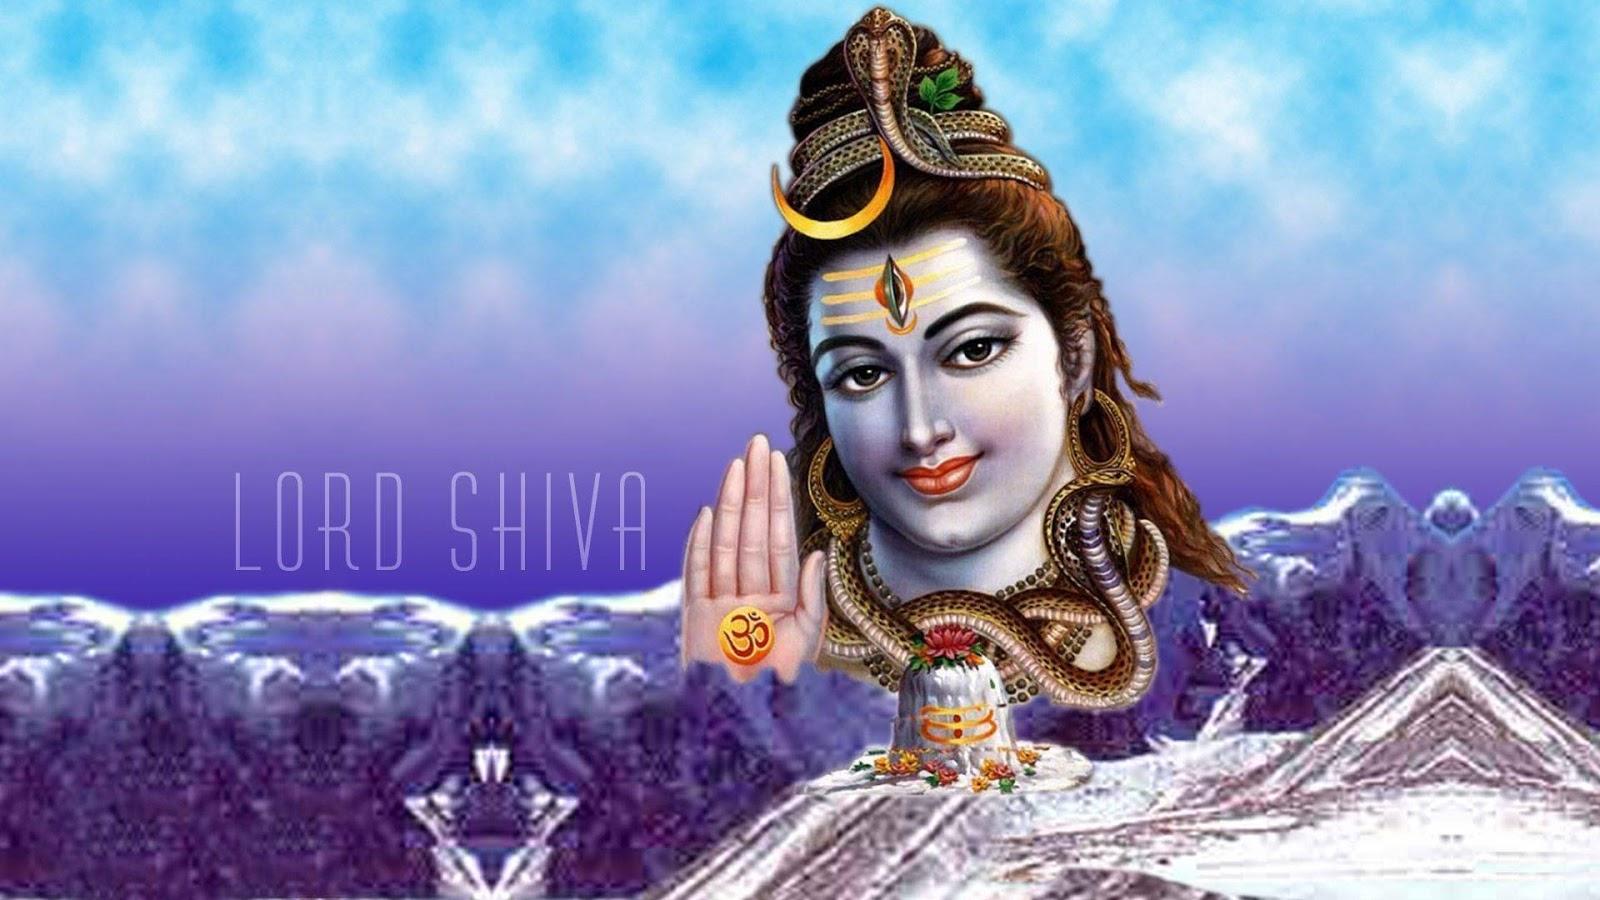 Lord Shiva Wallpapers HD 4K 1.1 APK Download